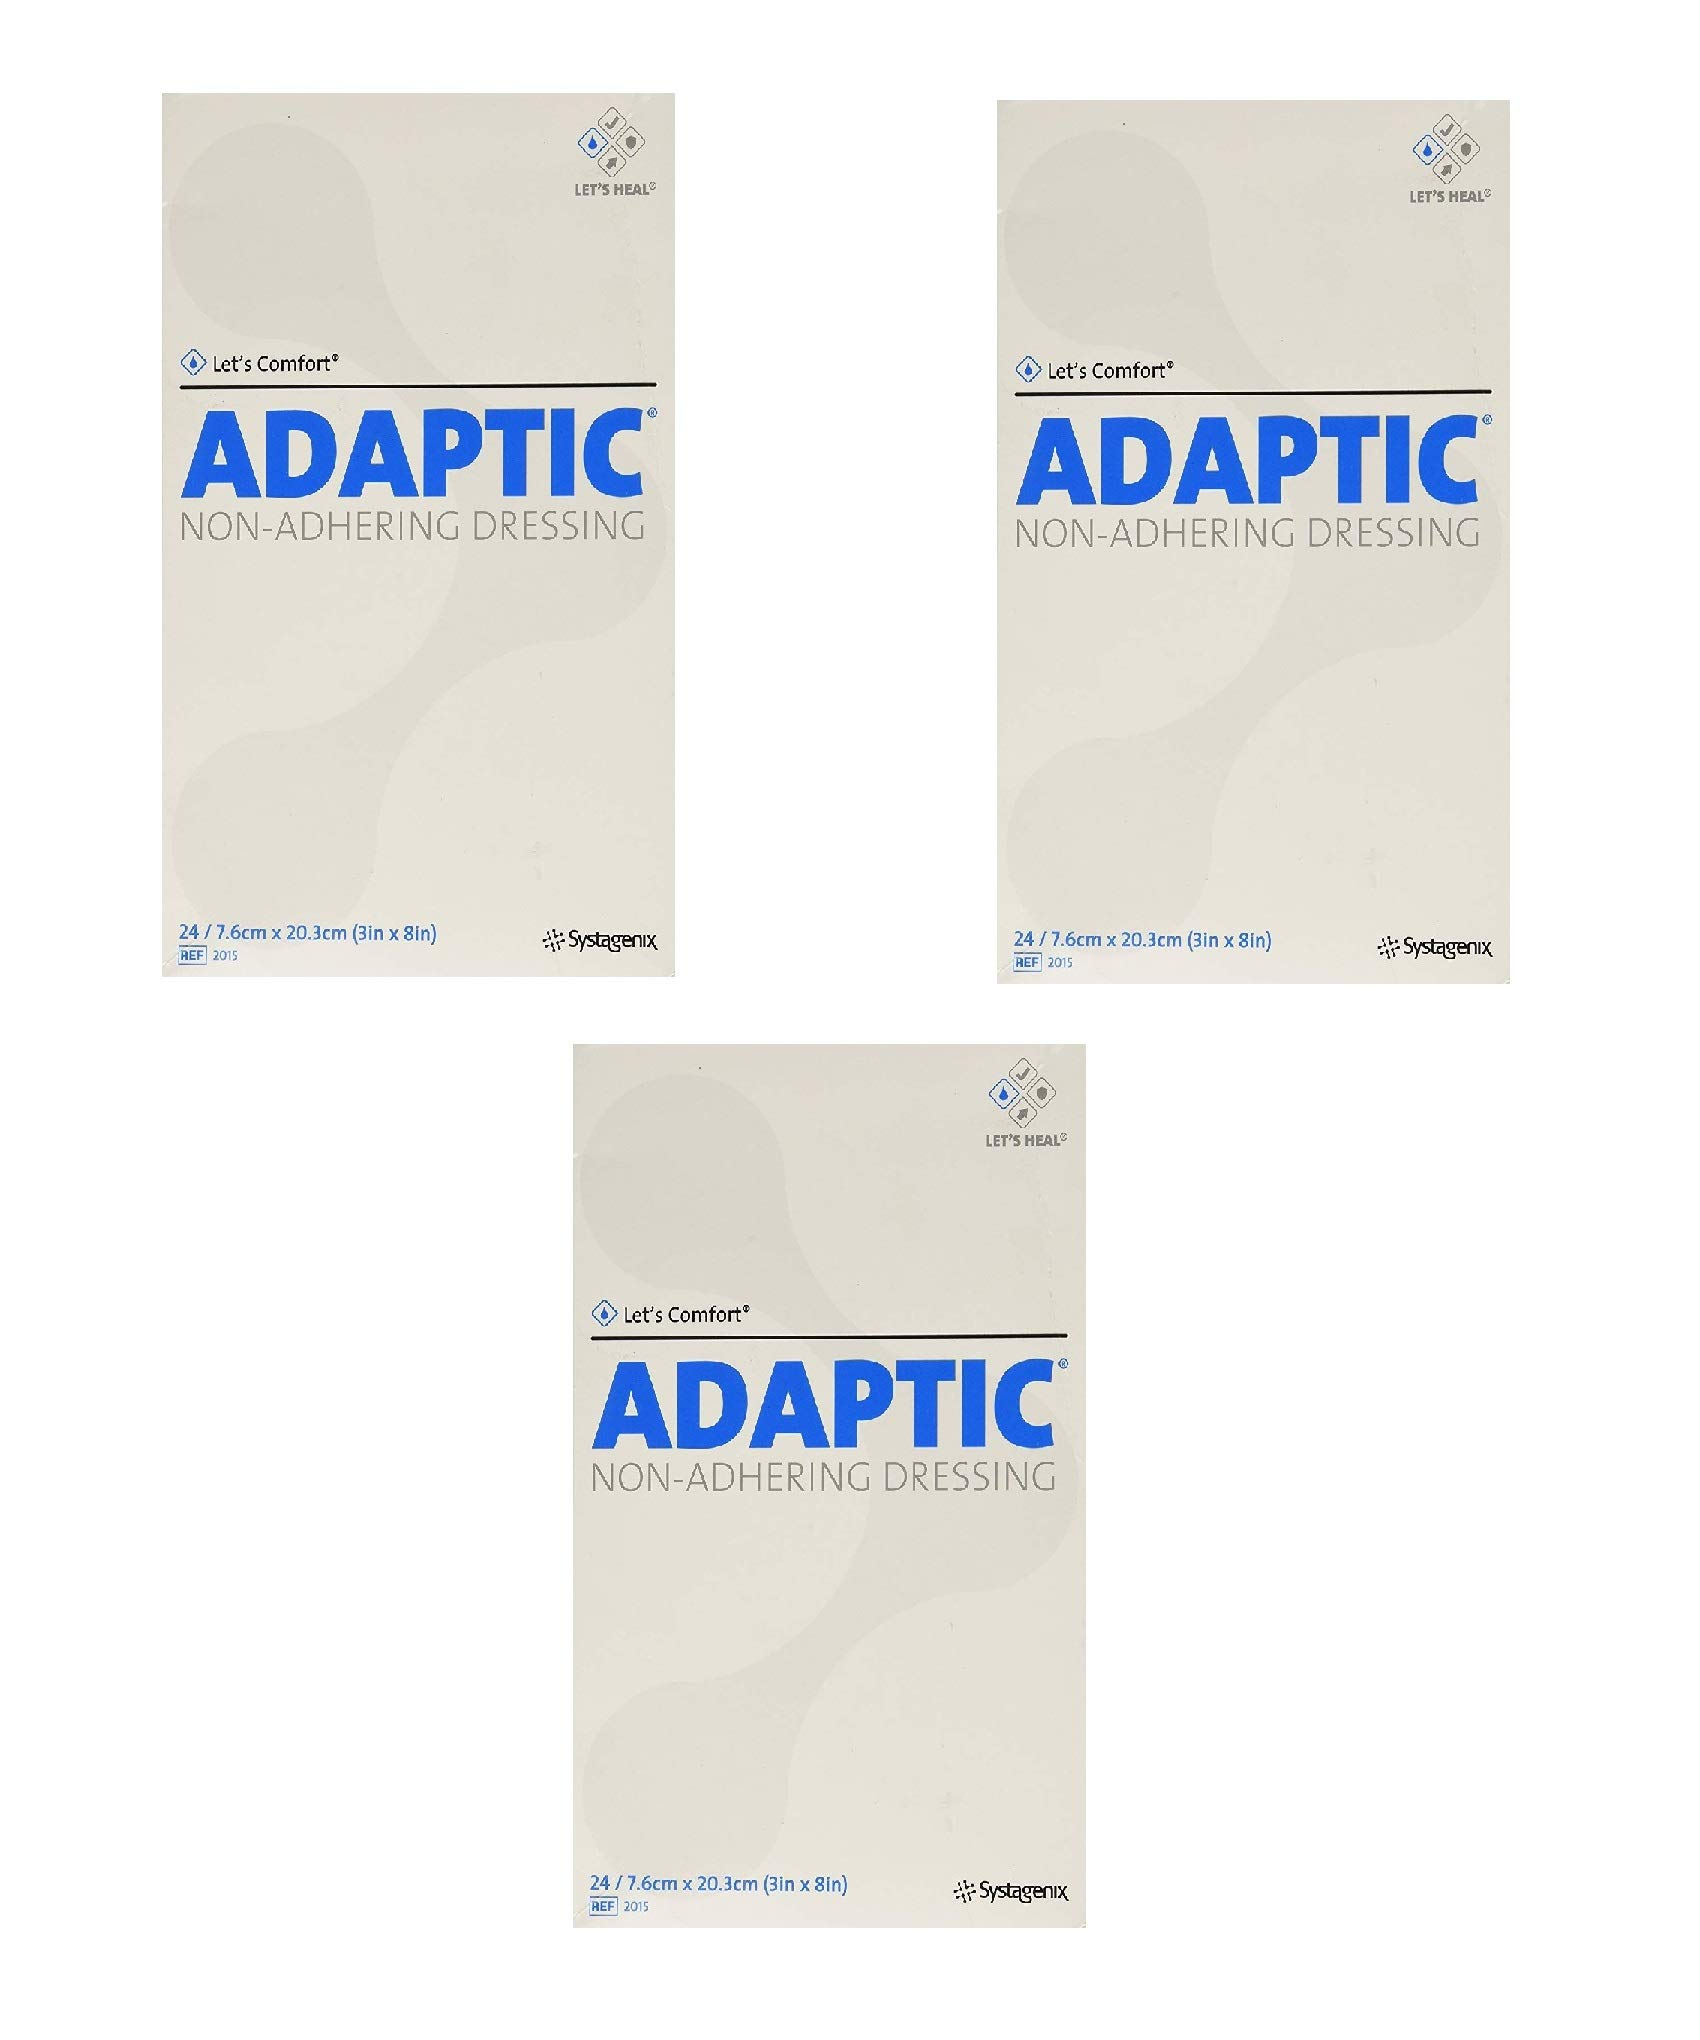 SYSTAGENIX WOUND MNGMNT Adaptic Non-Adhering Dressing, 24 Count (3 Pack) by SYSTAGENIX WOUND MNGMNT